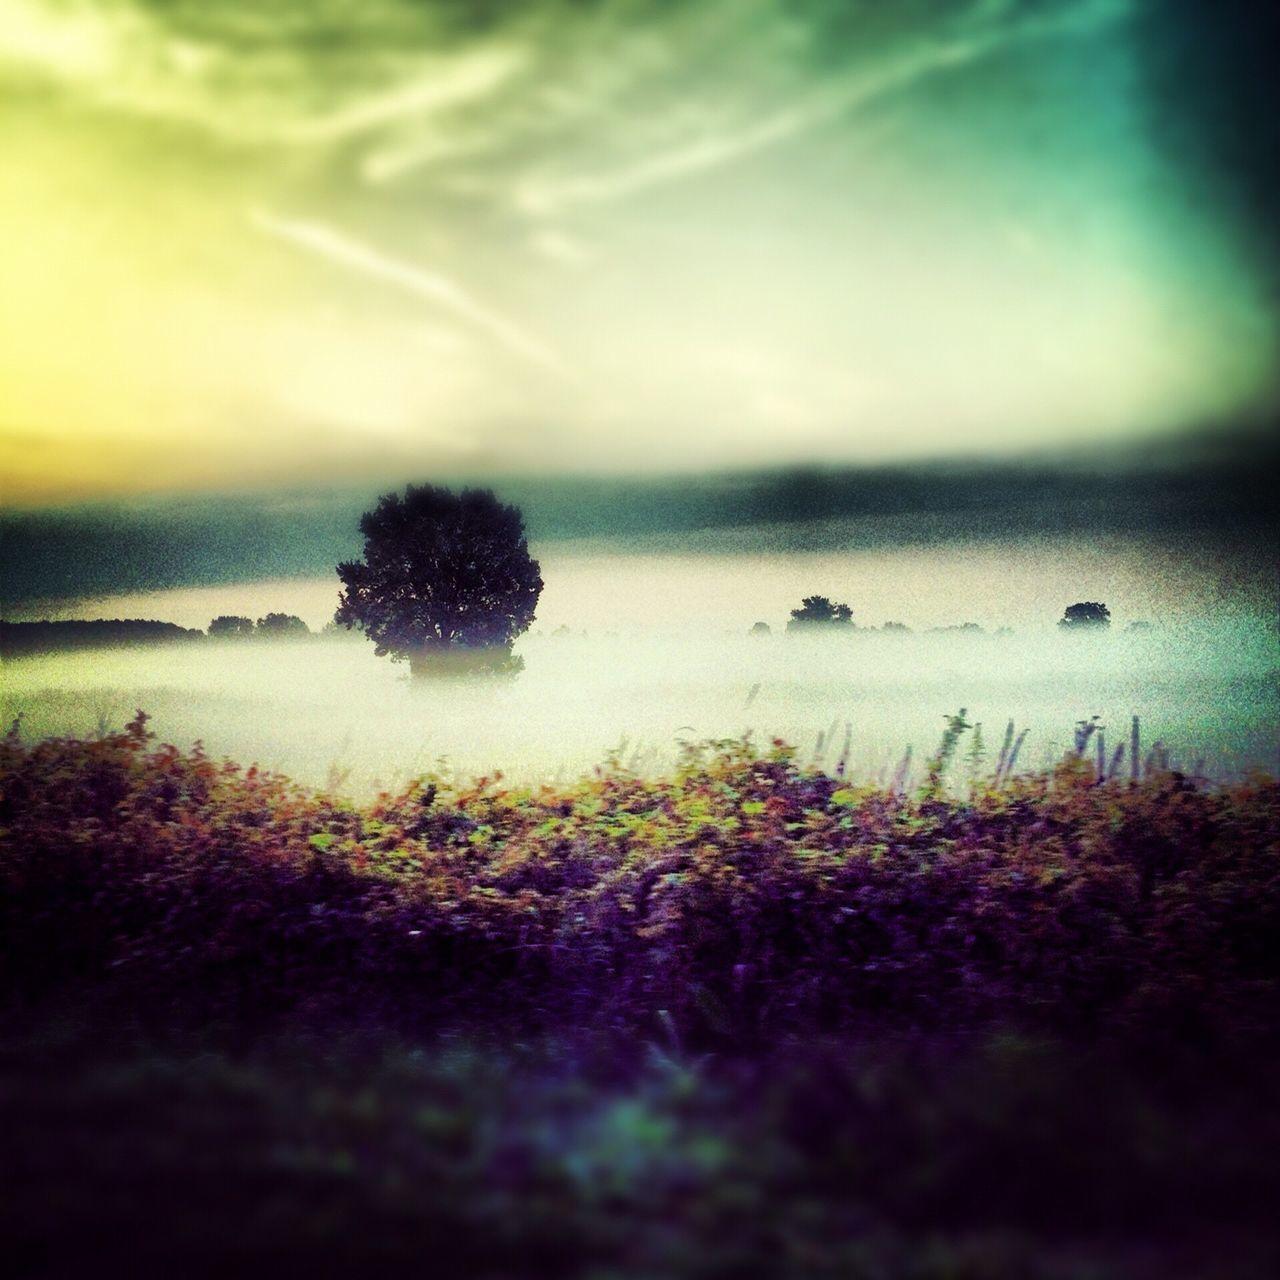 Fog Landscape Field Sunrise The Great Outdoors - 2017 EyeEm Awards